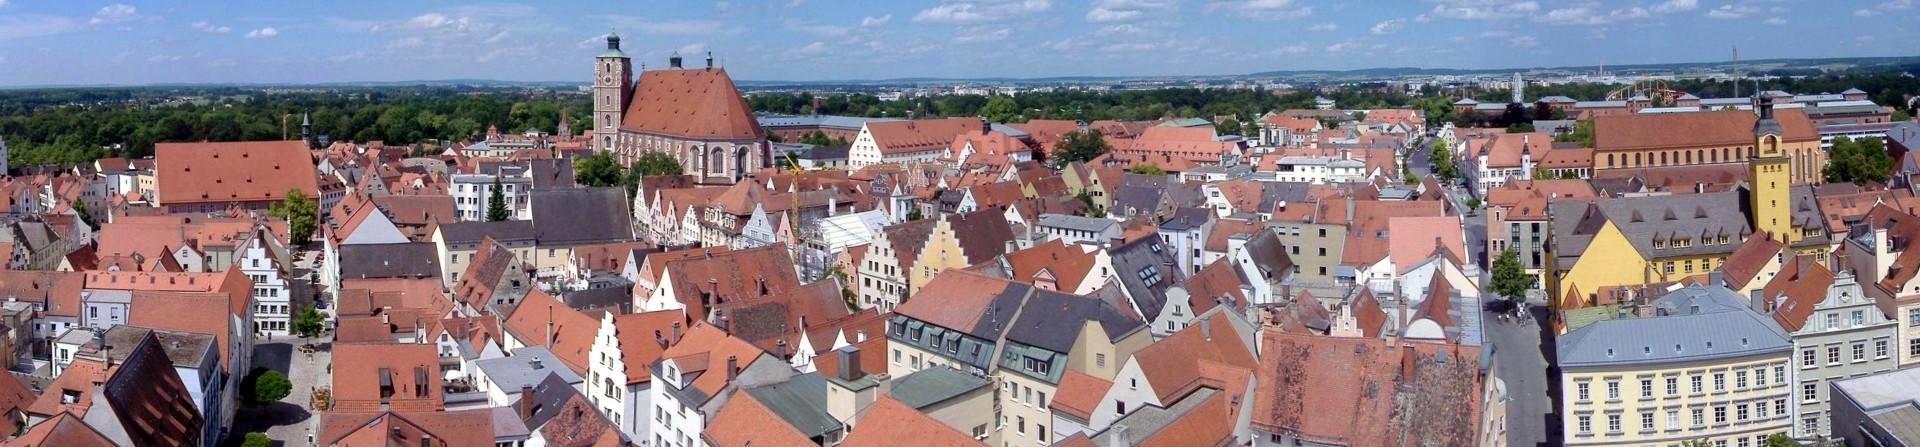 ingolstadt_panorama_nord